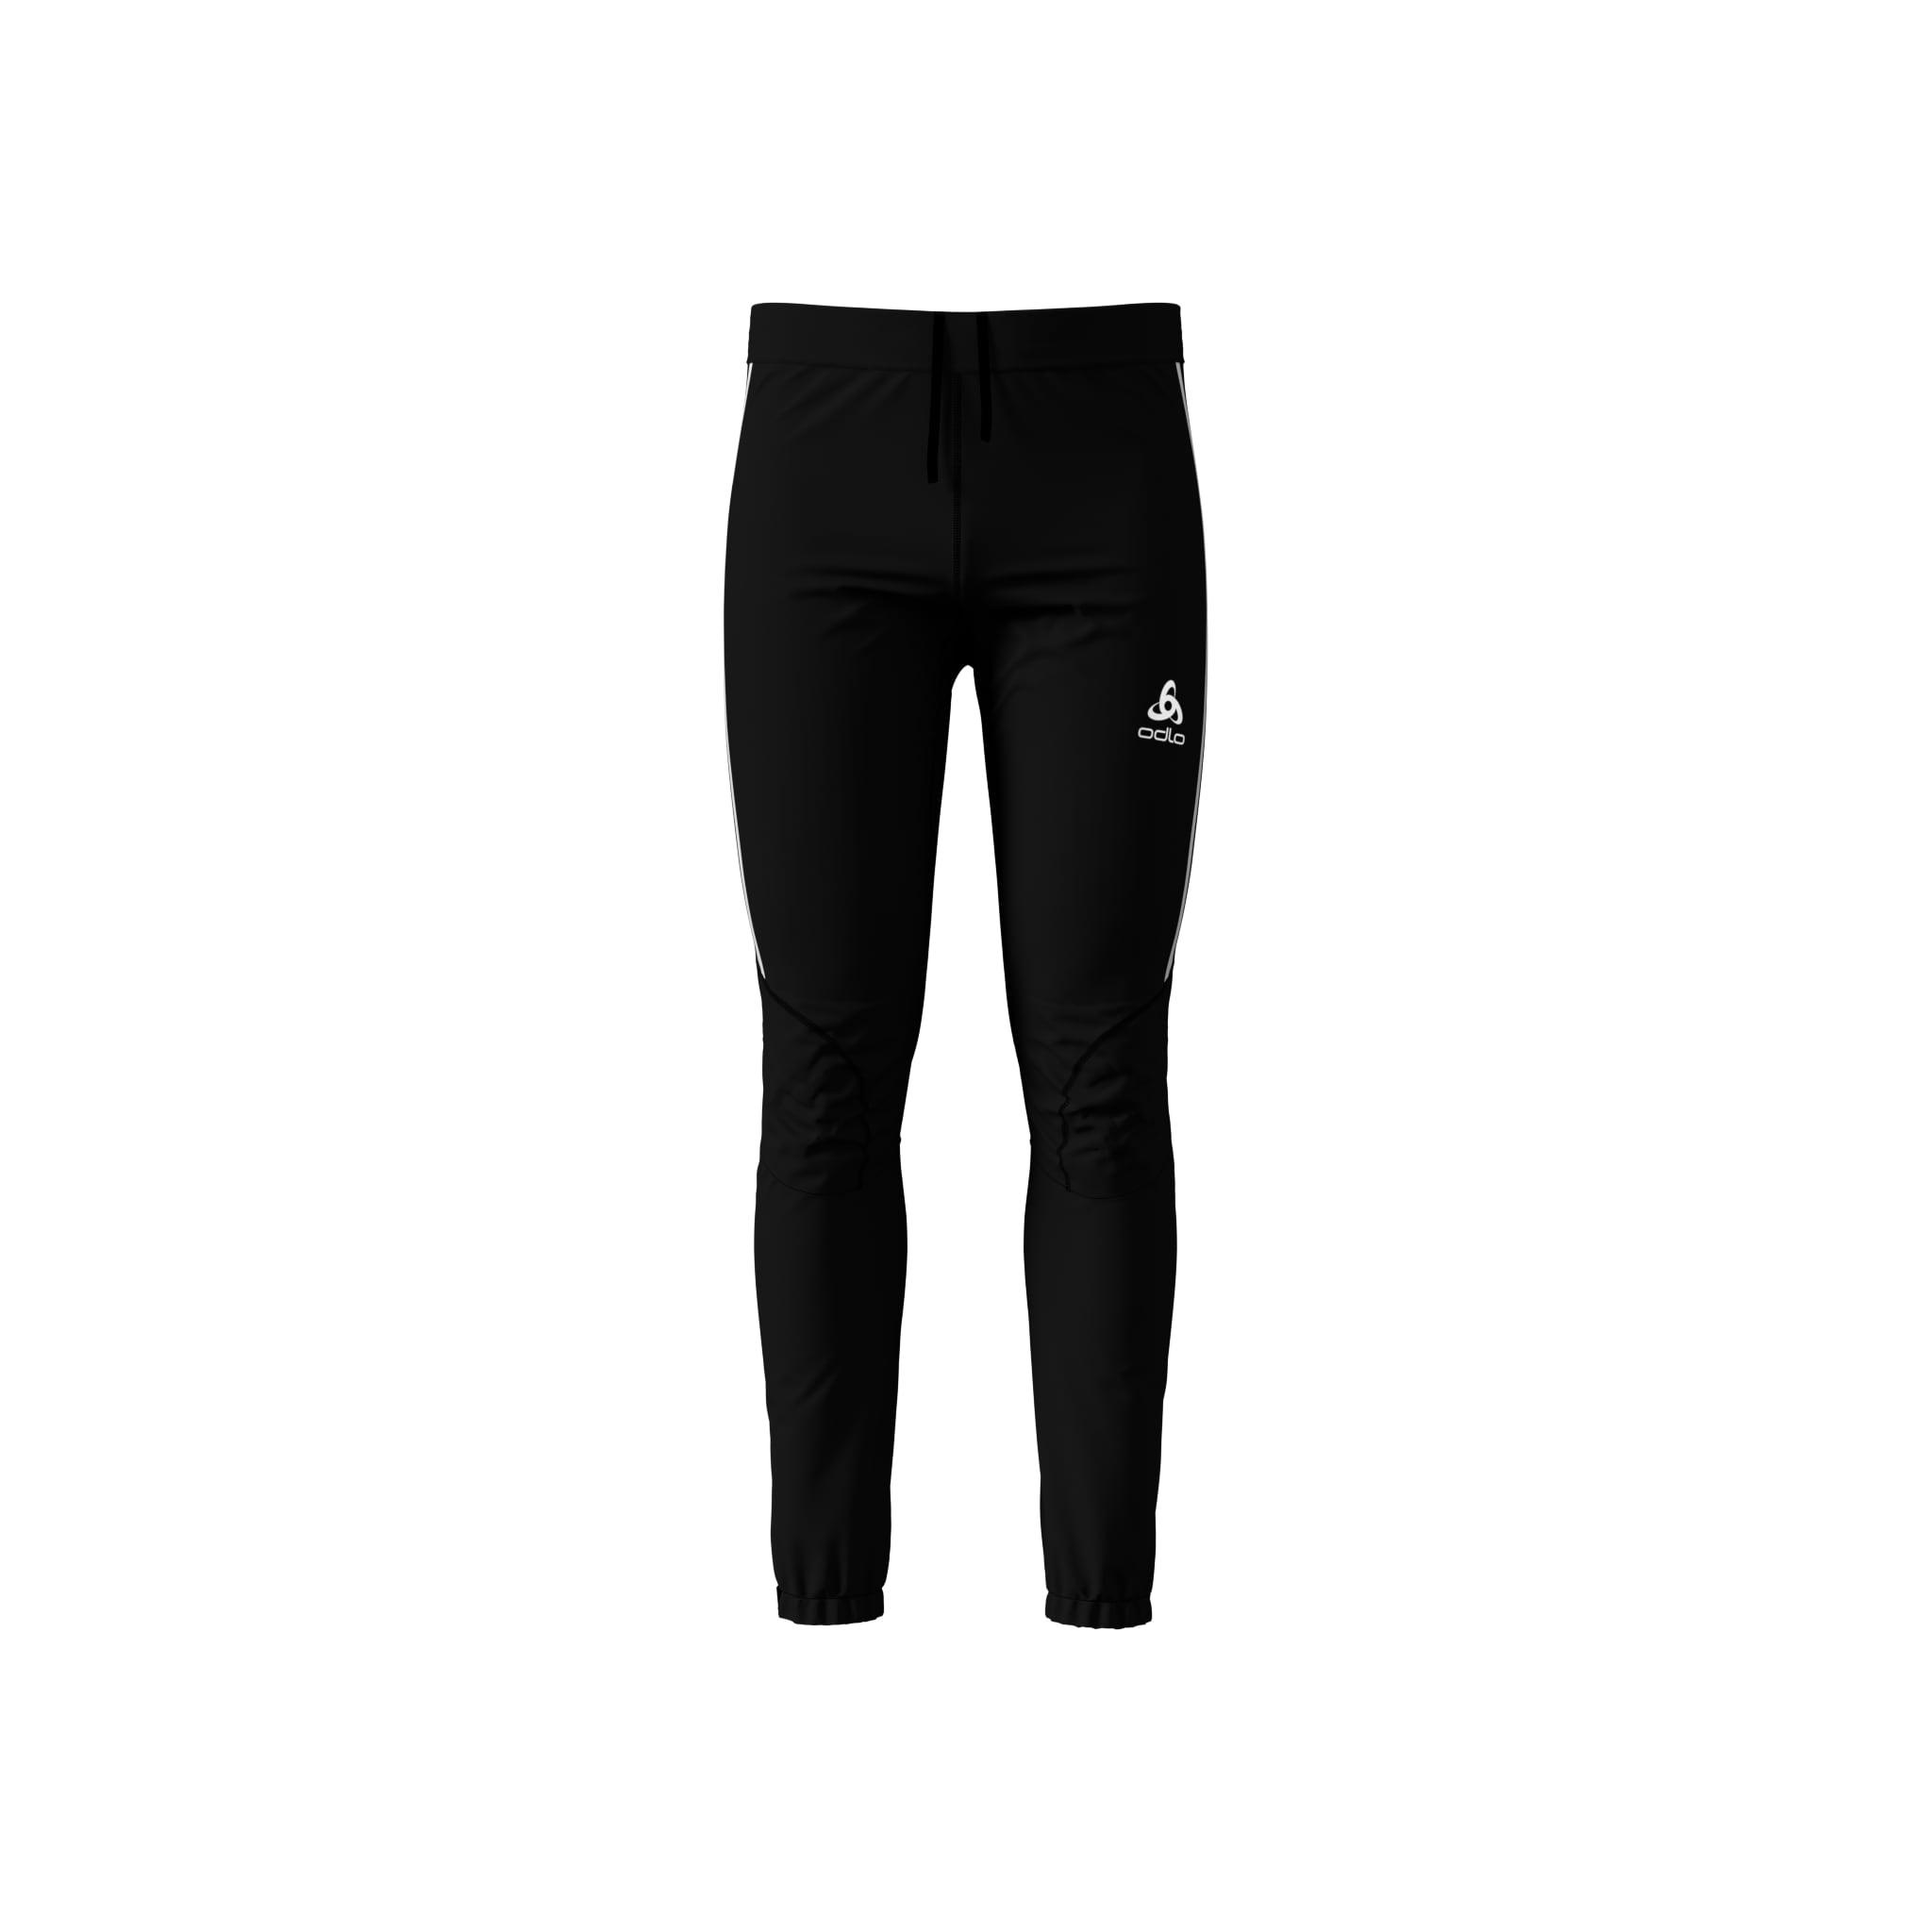 Aeolus Pro Warm Pants